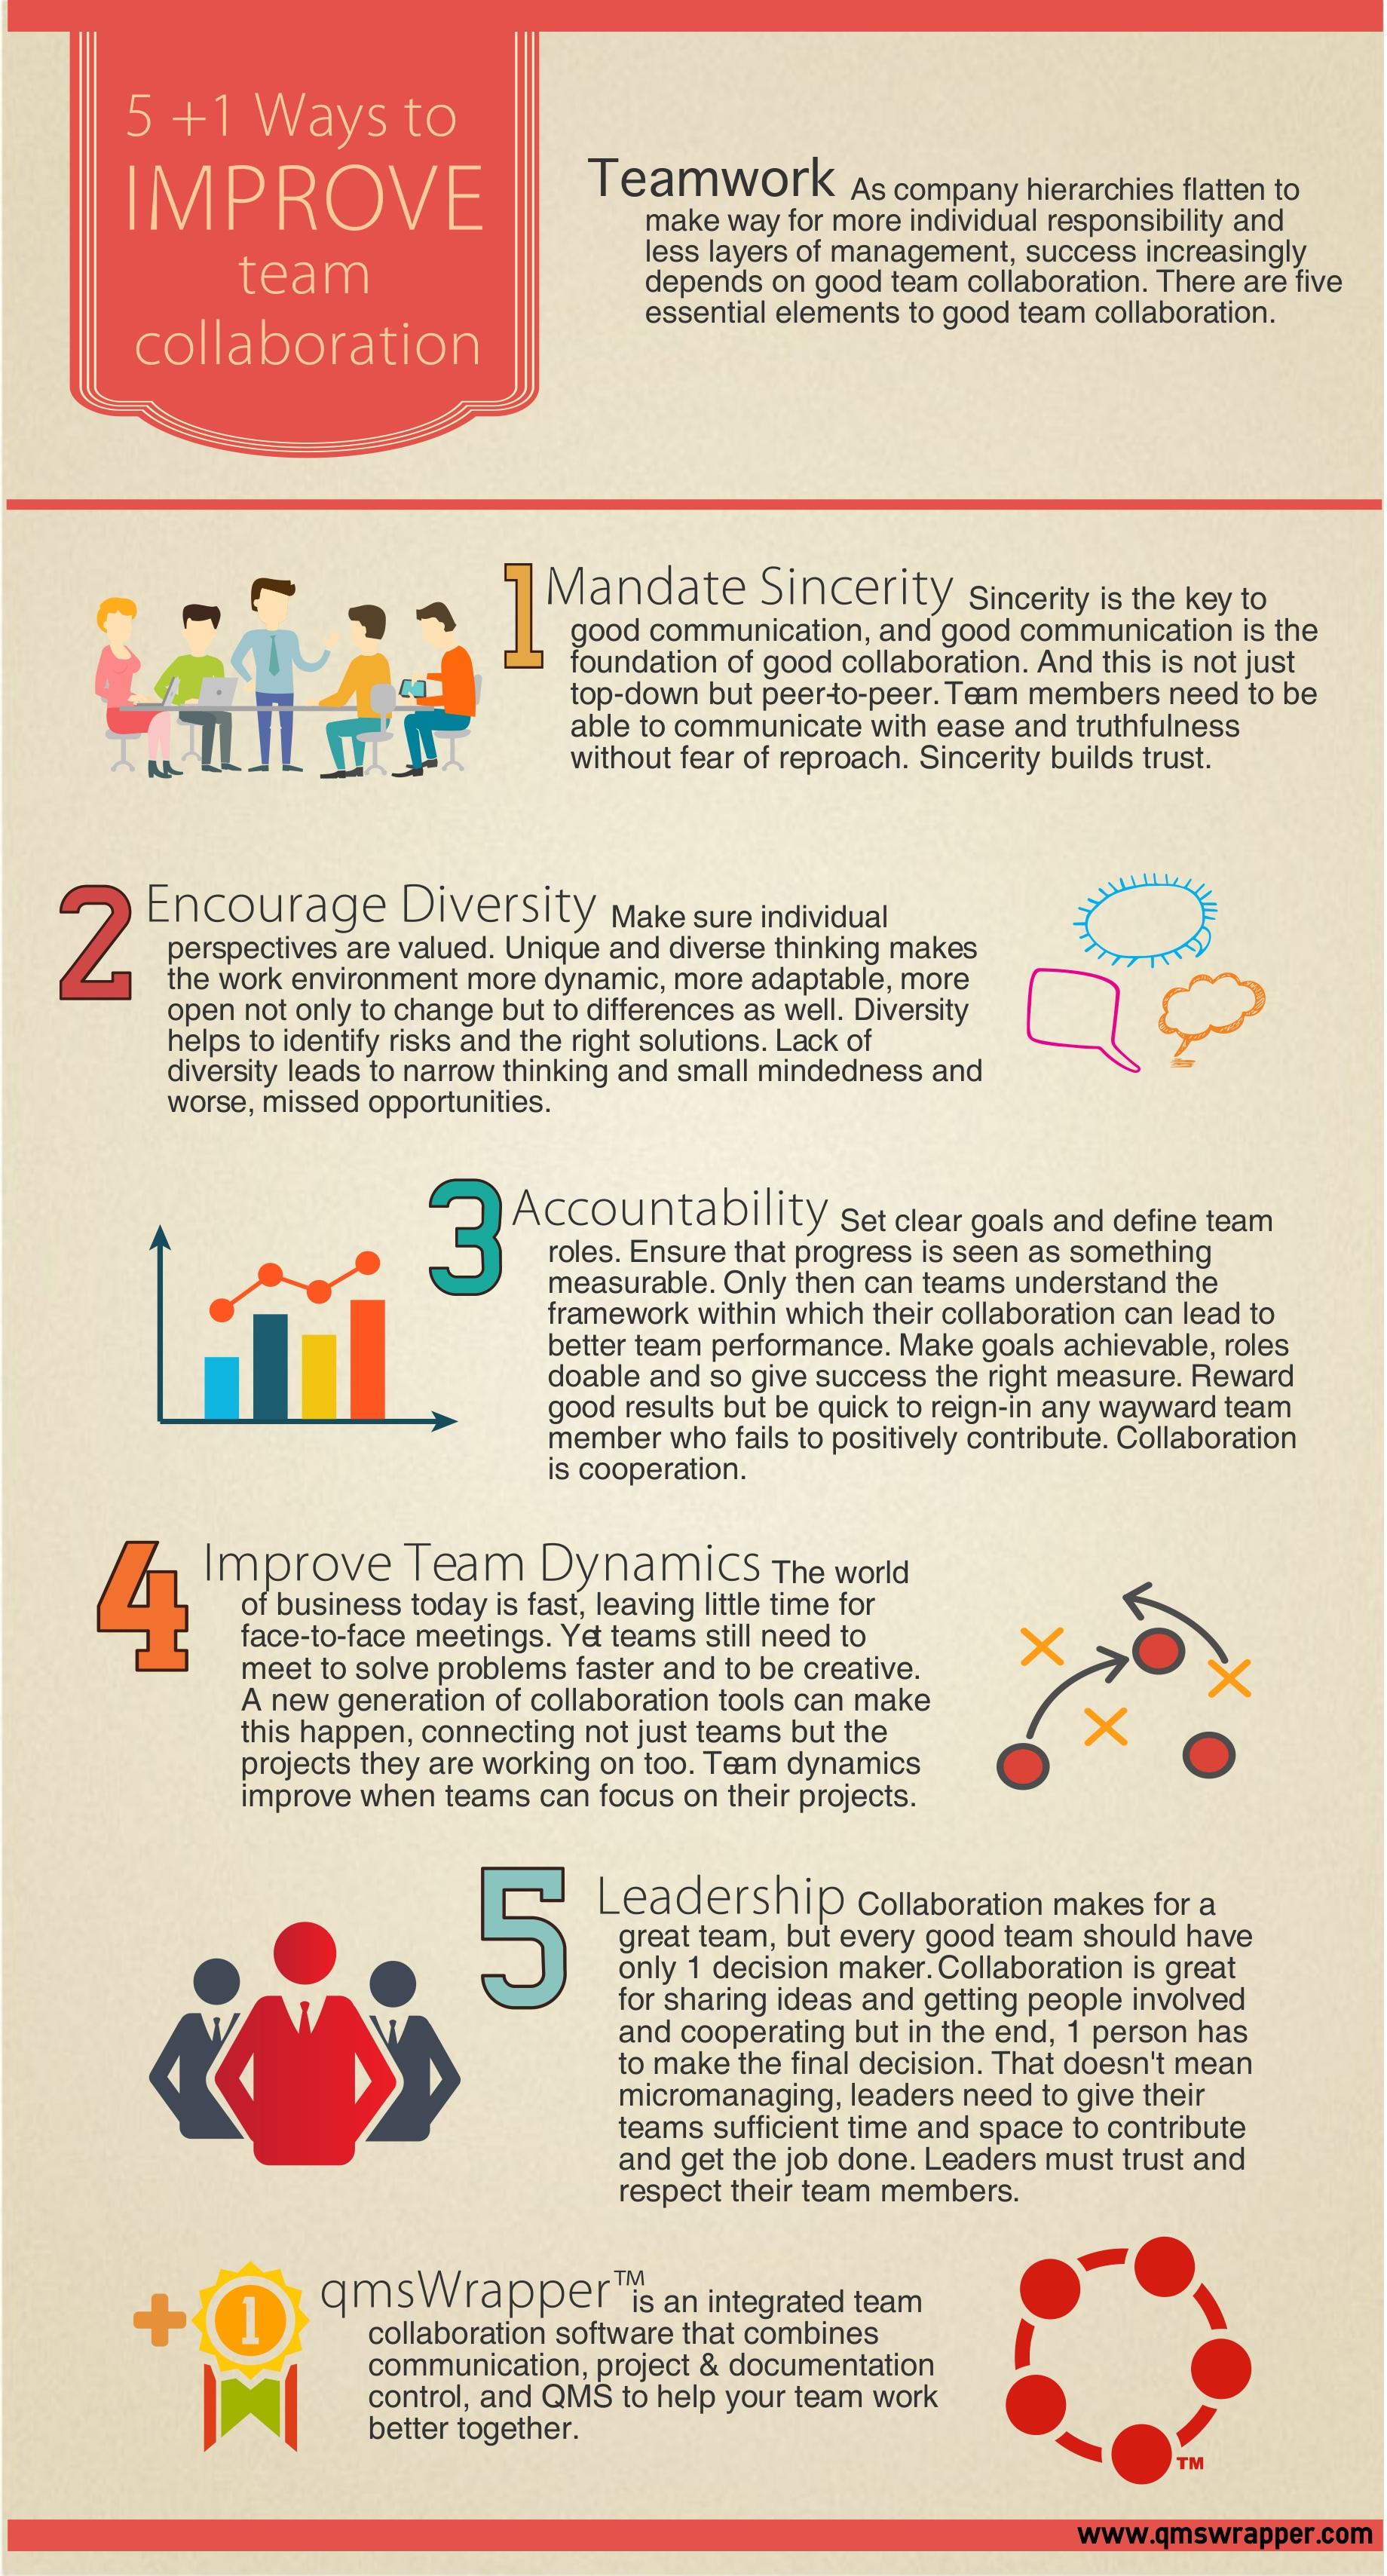 5+1 Ways to Improve Team Collaboration | qmsWrapper